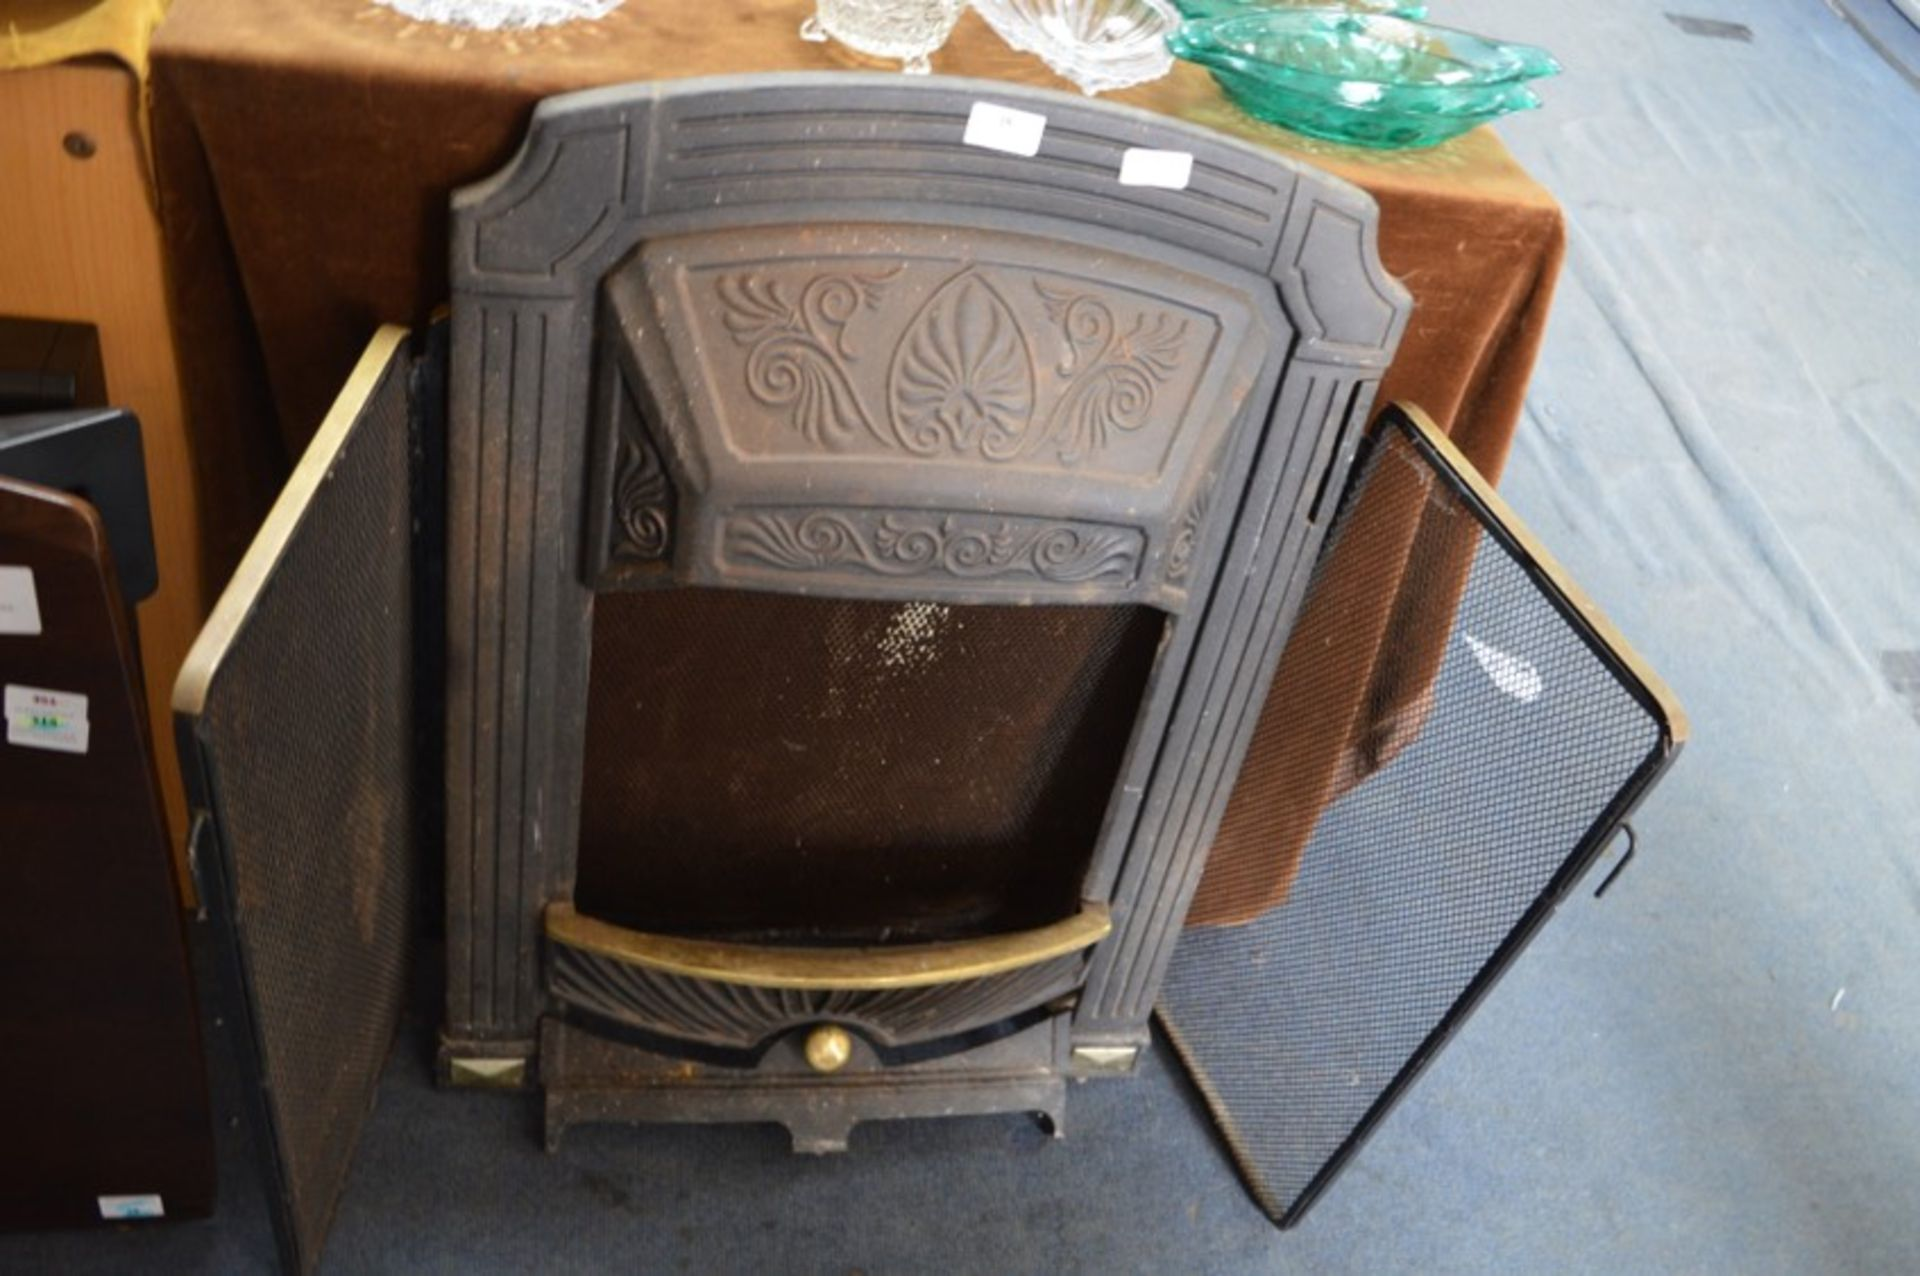 Cast Iron Fire Place and a Brass Fire Screen